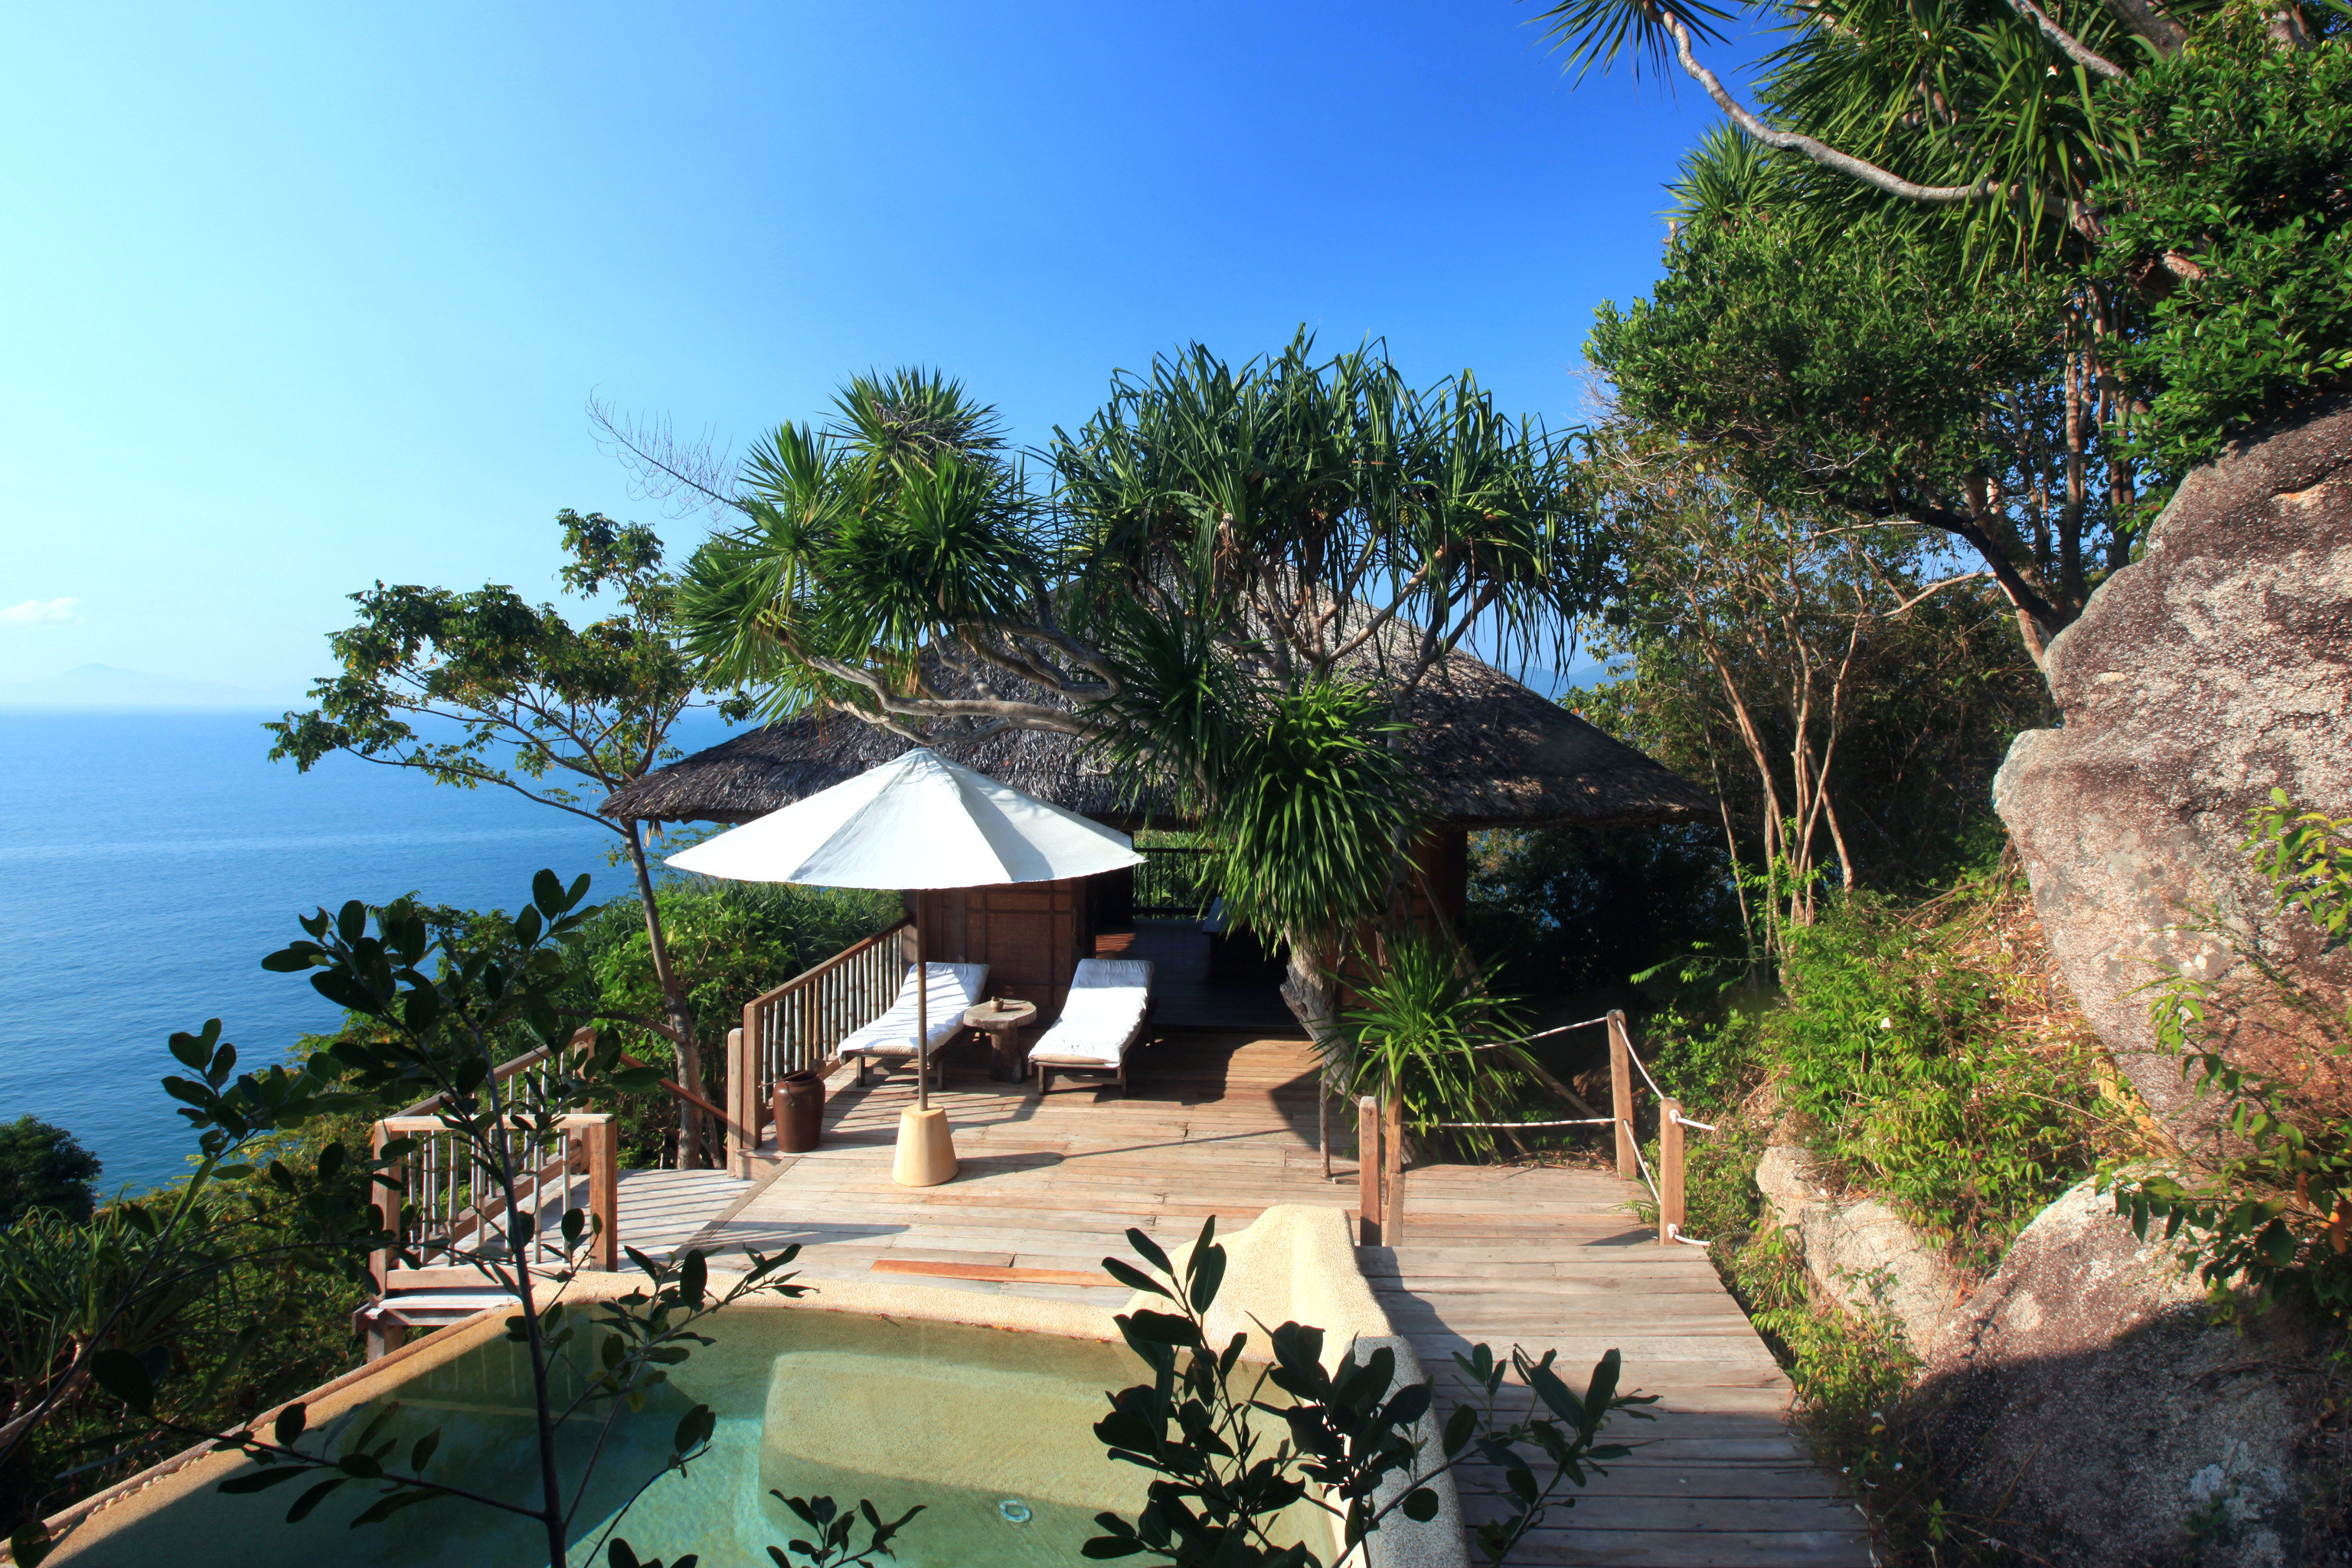 Beachfront Deck Eco Jungle Romance Scenic views Tropical Waterfront tree sky Resort palm Beach arecales tropics plant Villa Sea Village